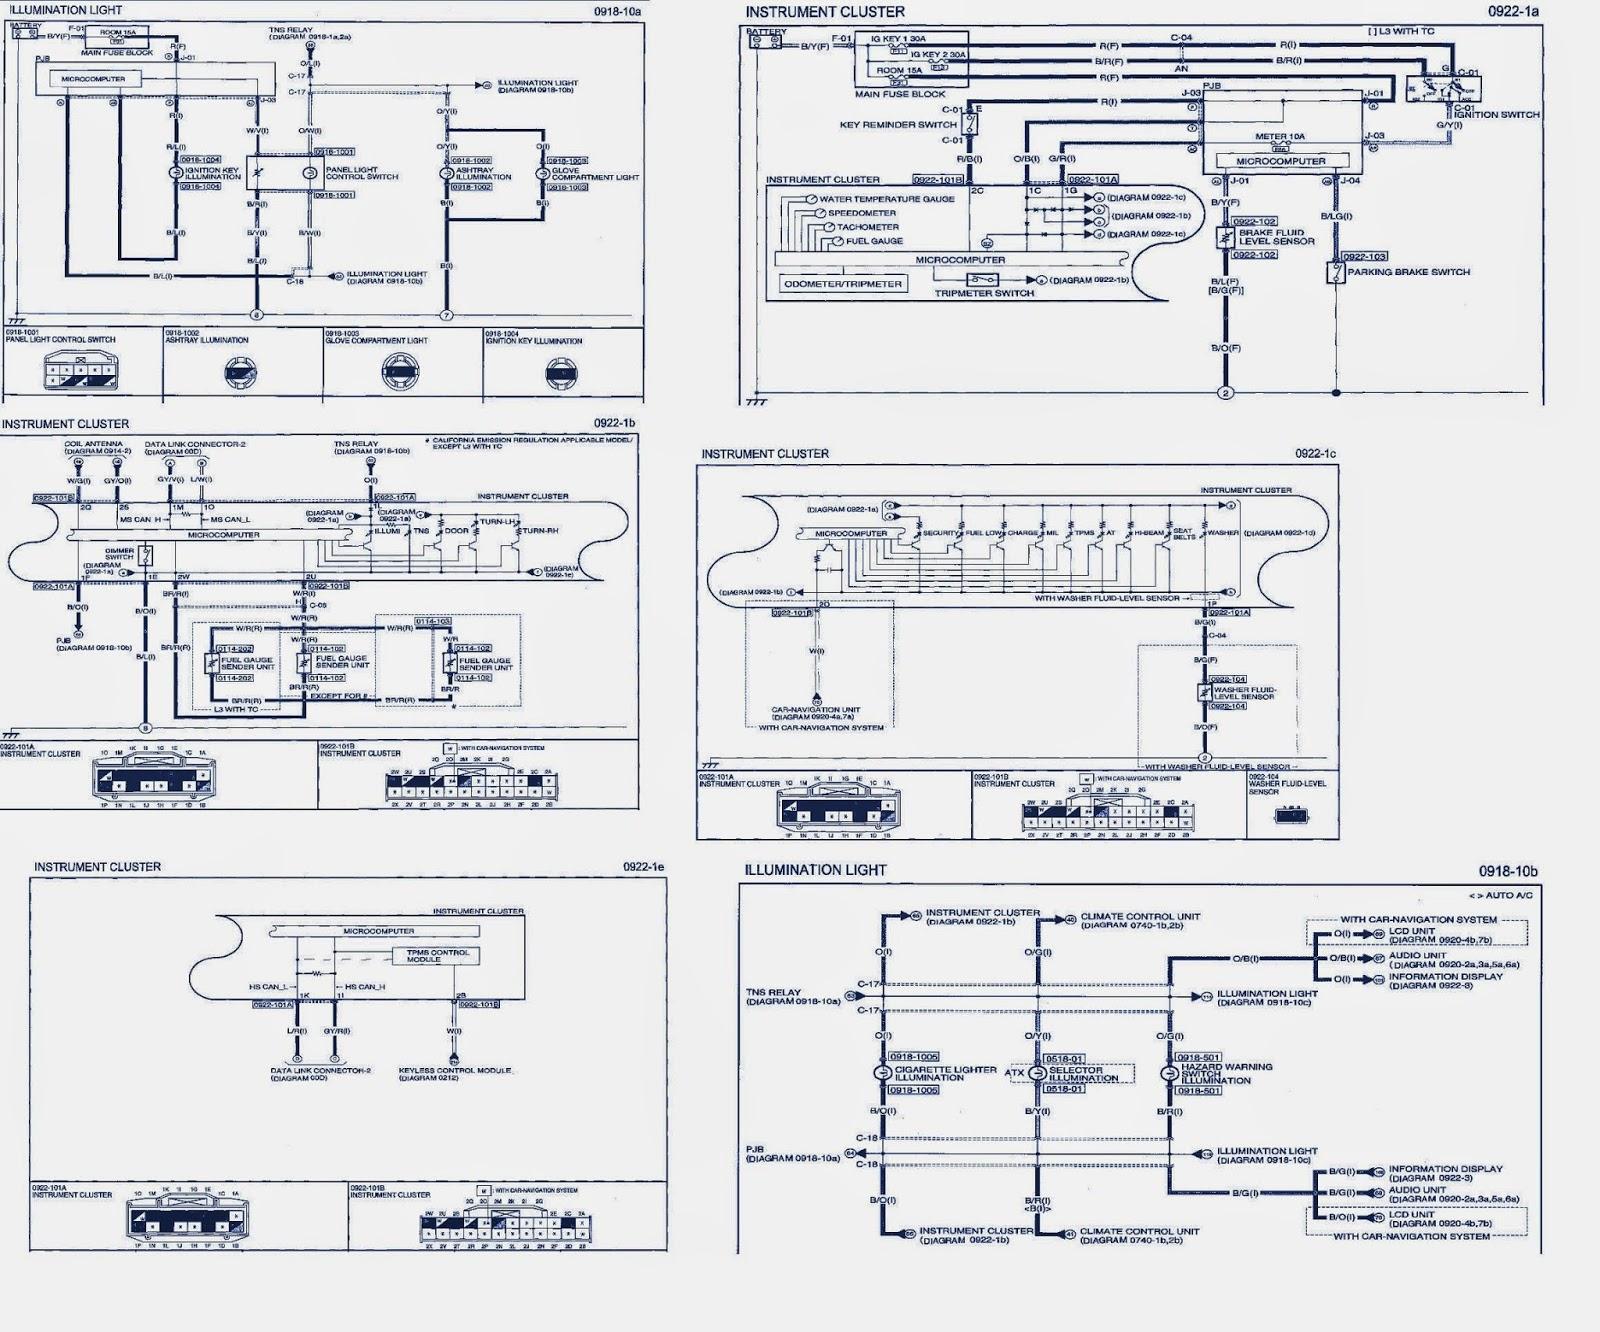 2008 Mazda 3 Wiring Diagram | Auto Wiring Diagrams